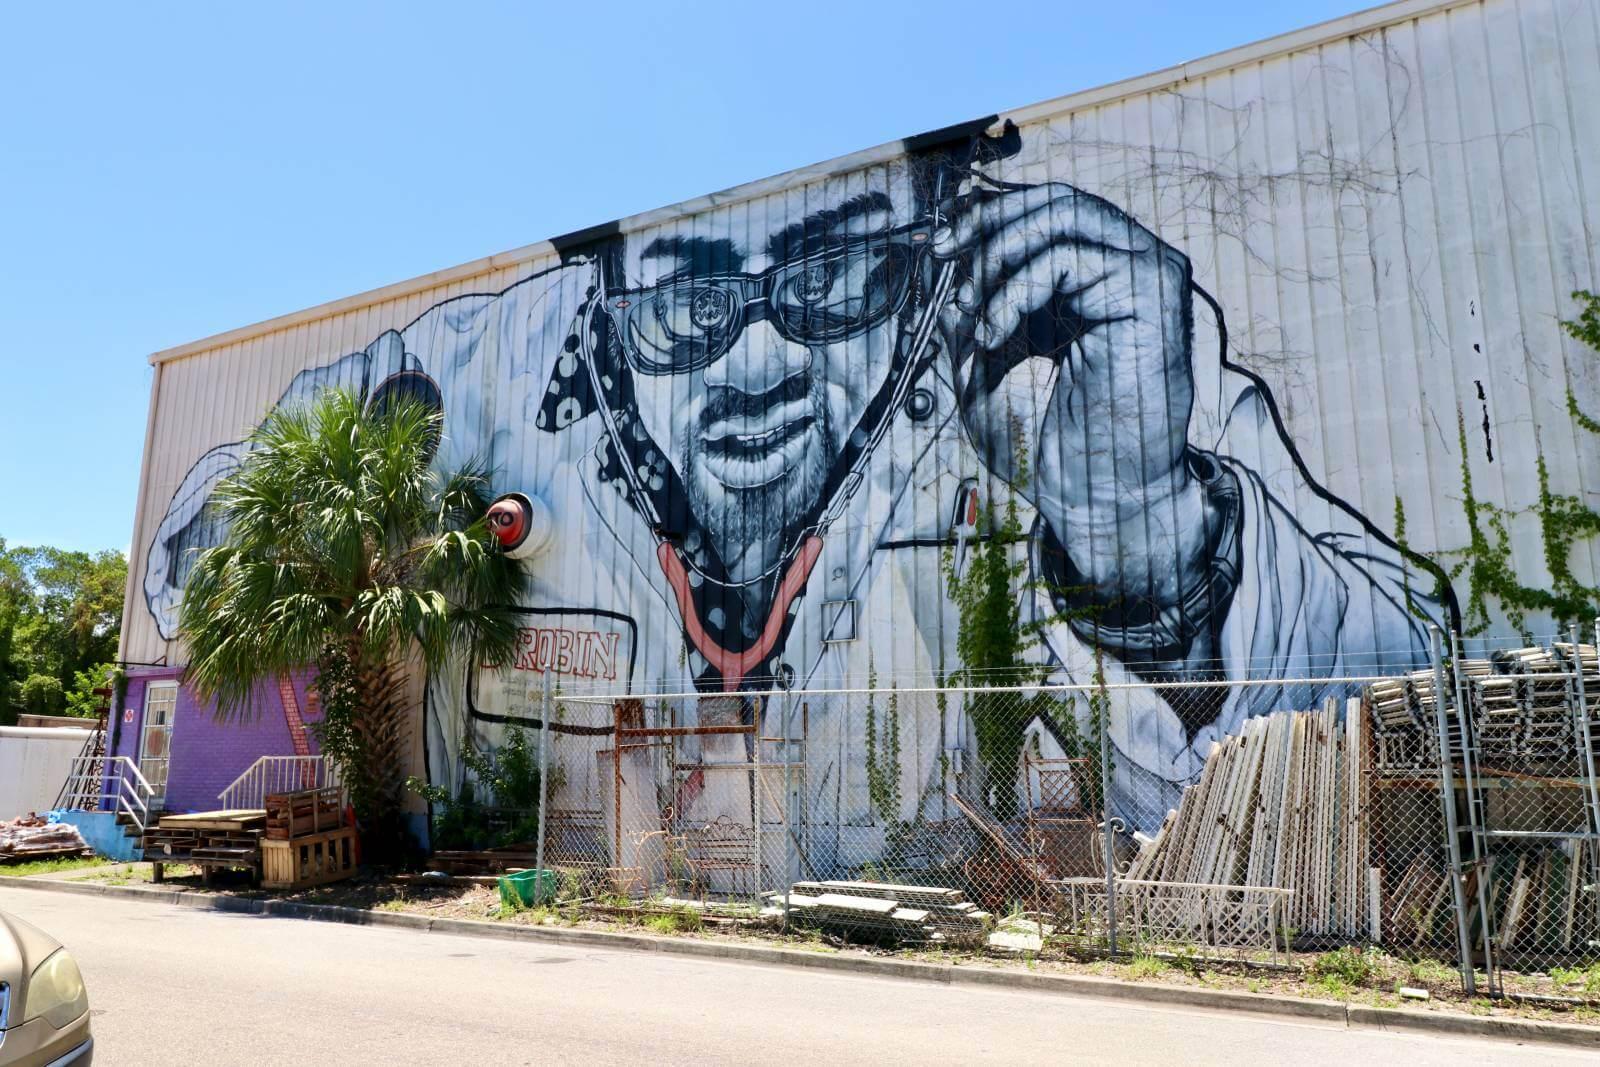 Mateo aka MTO street art in Sarasota, Florida street art and murals. Photo credit Nita Ettinger. Must Do Visitor Guides | MustDo.com